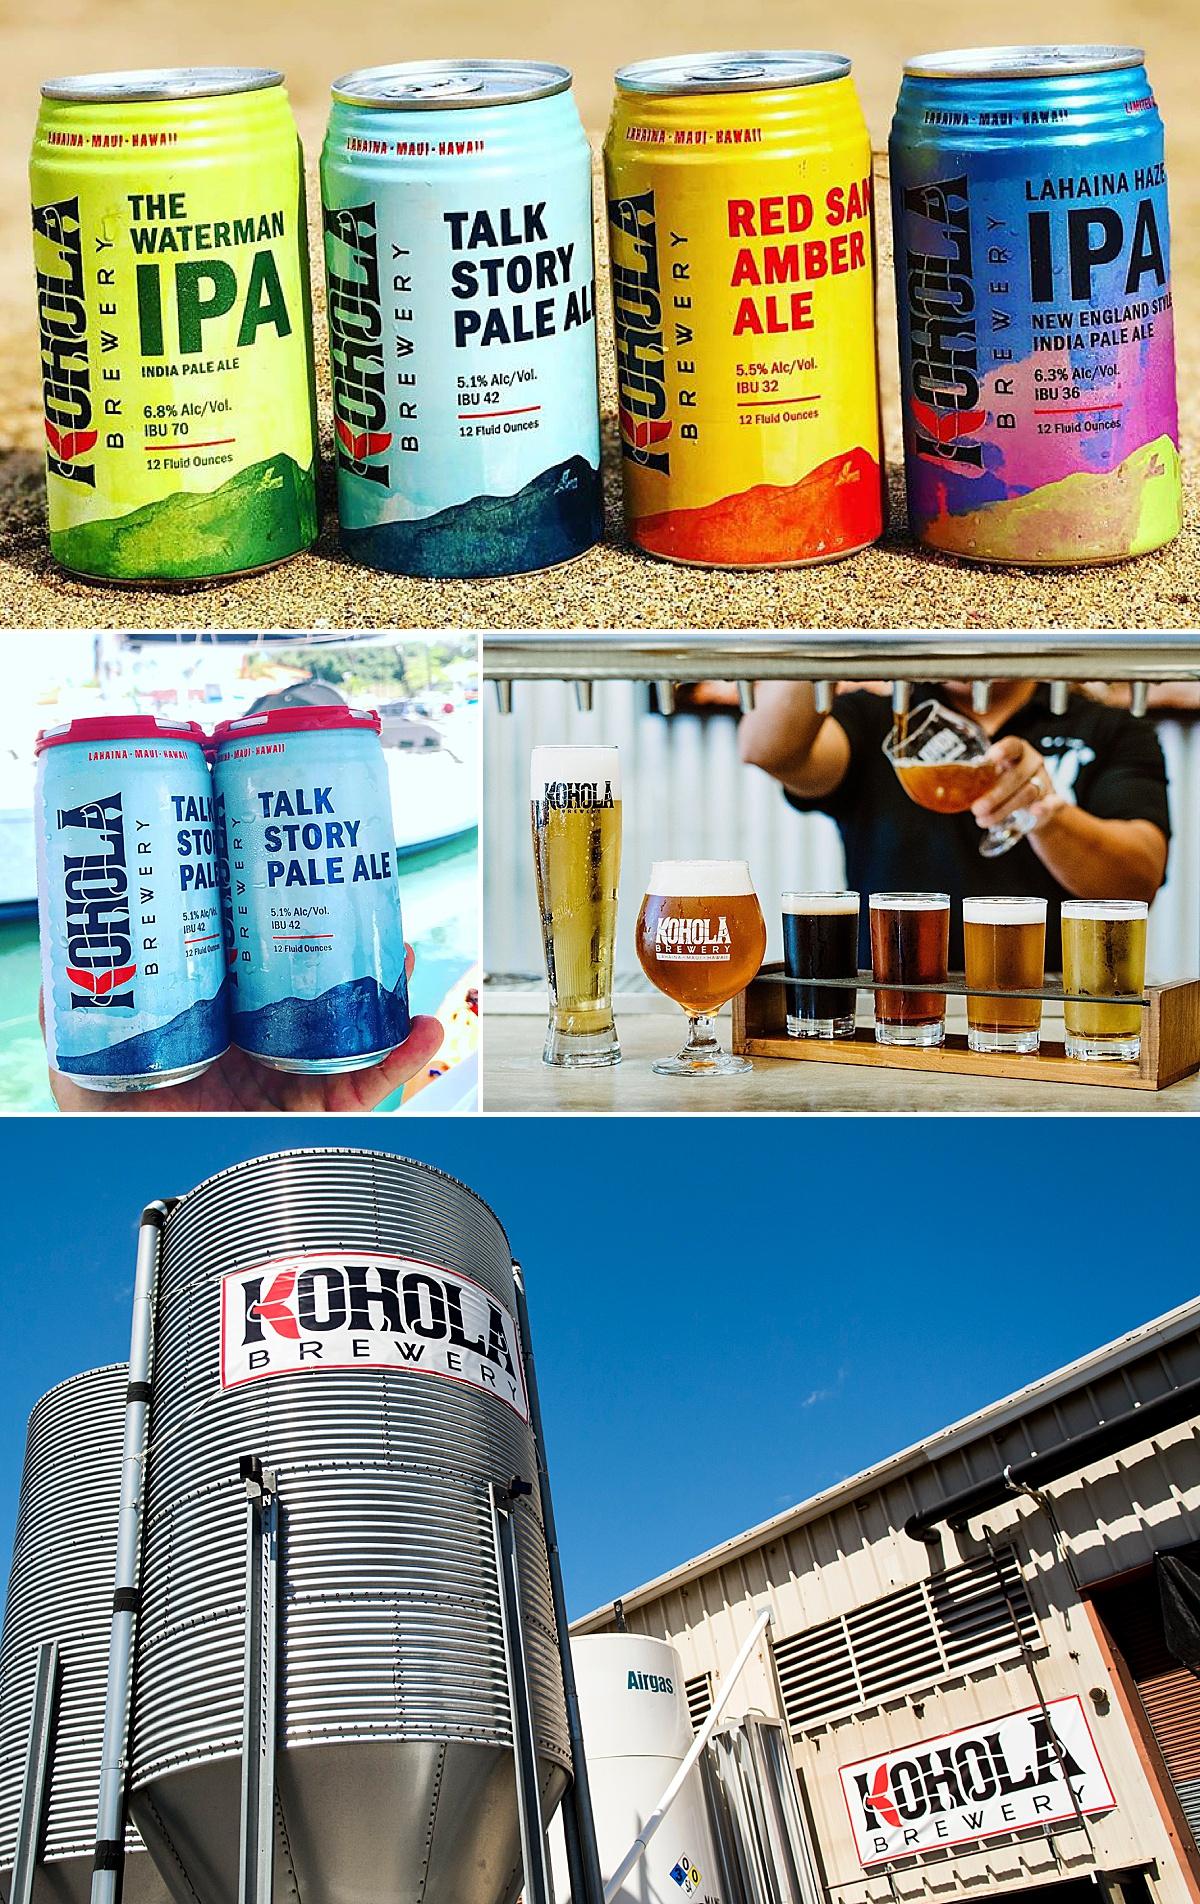 kohola brewery talk story